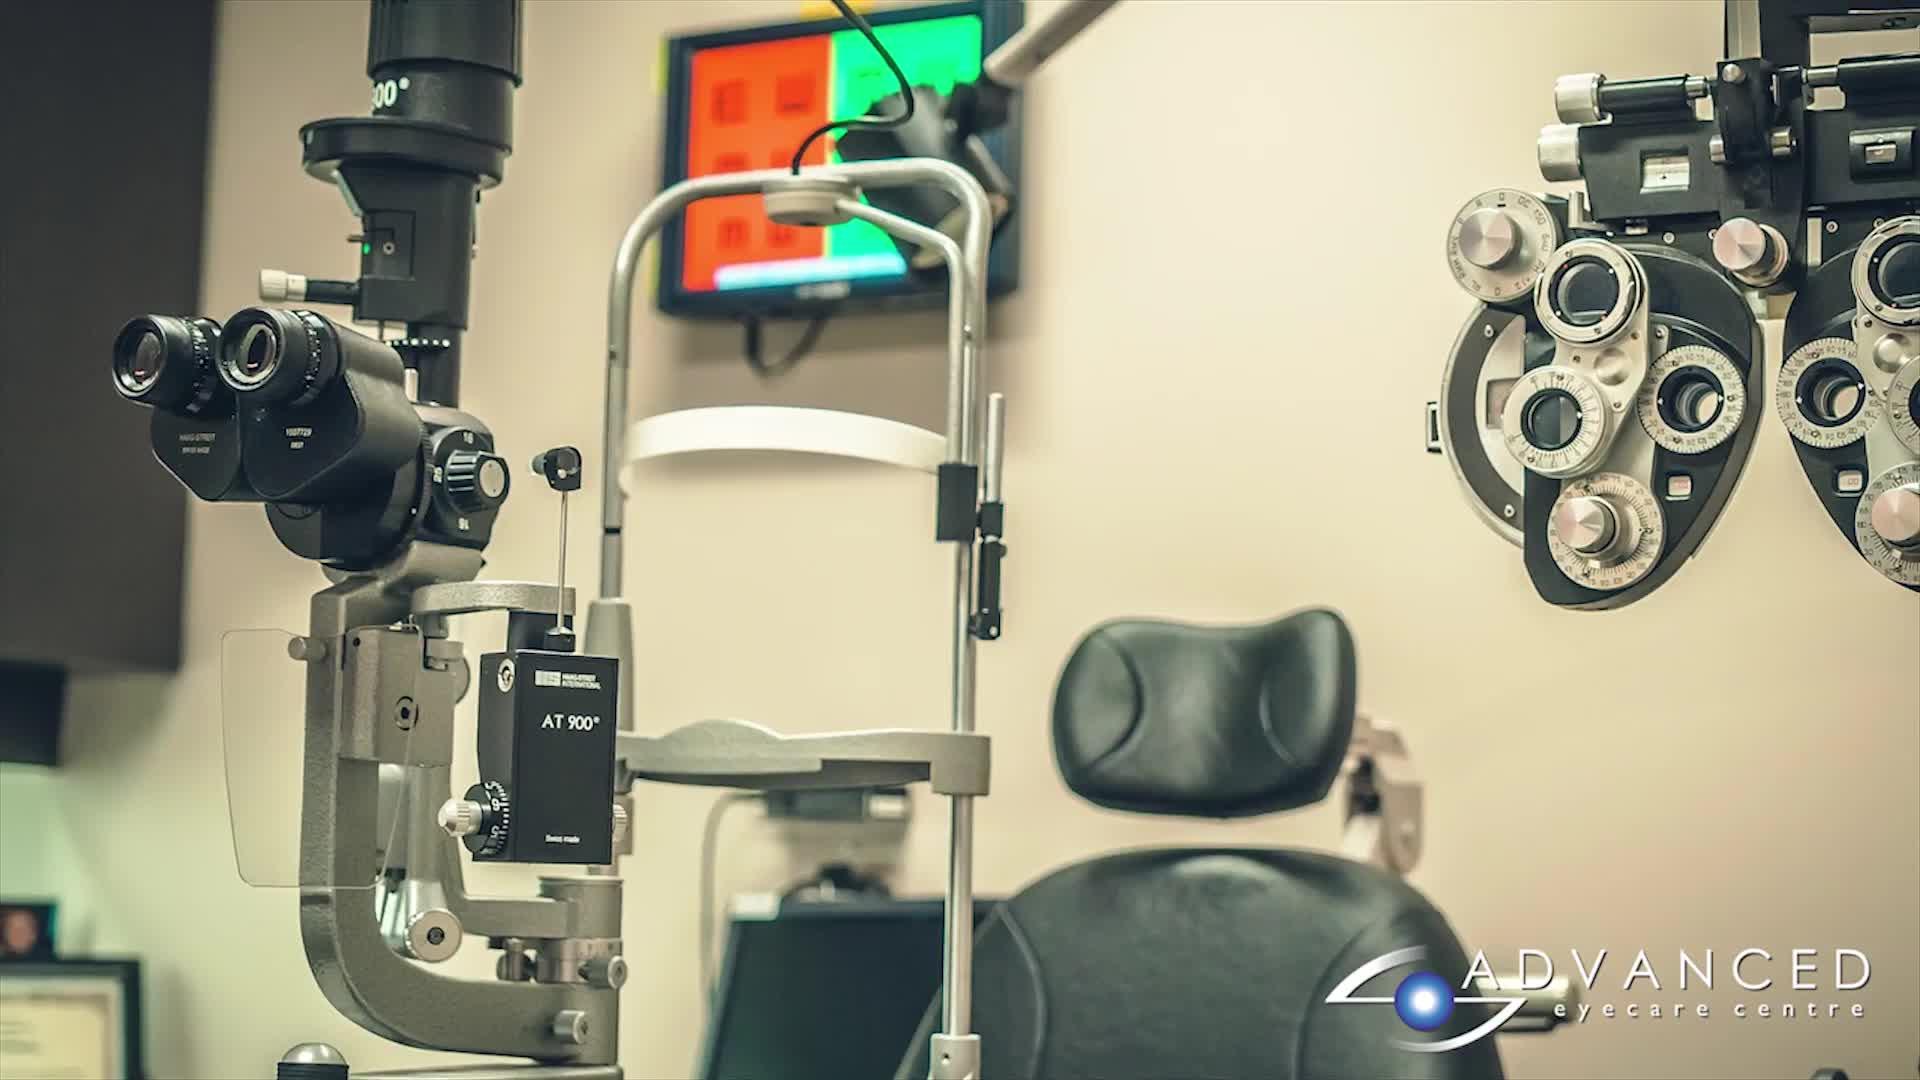 View Advanced Eyecare Centre's Calgary profile